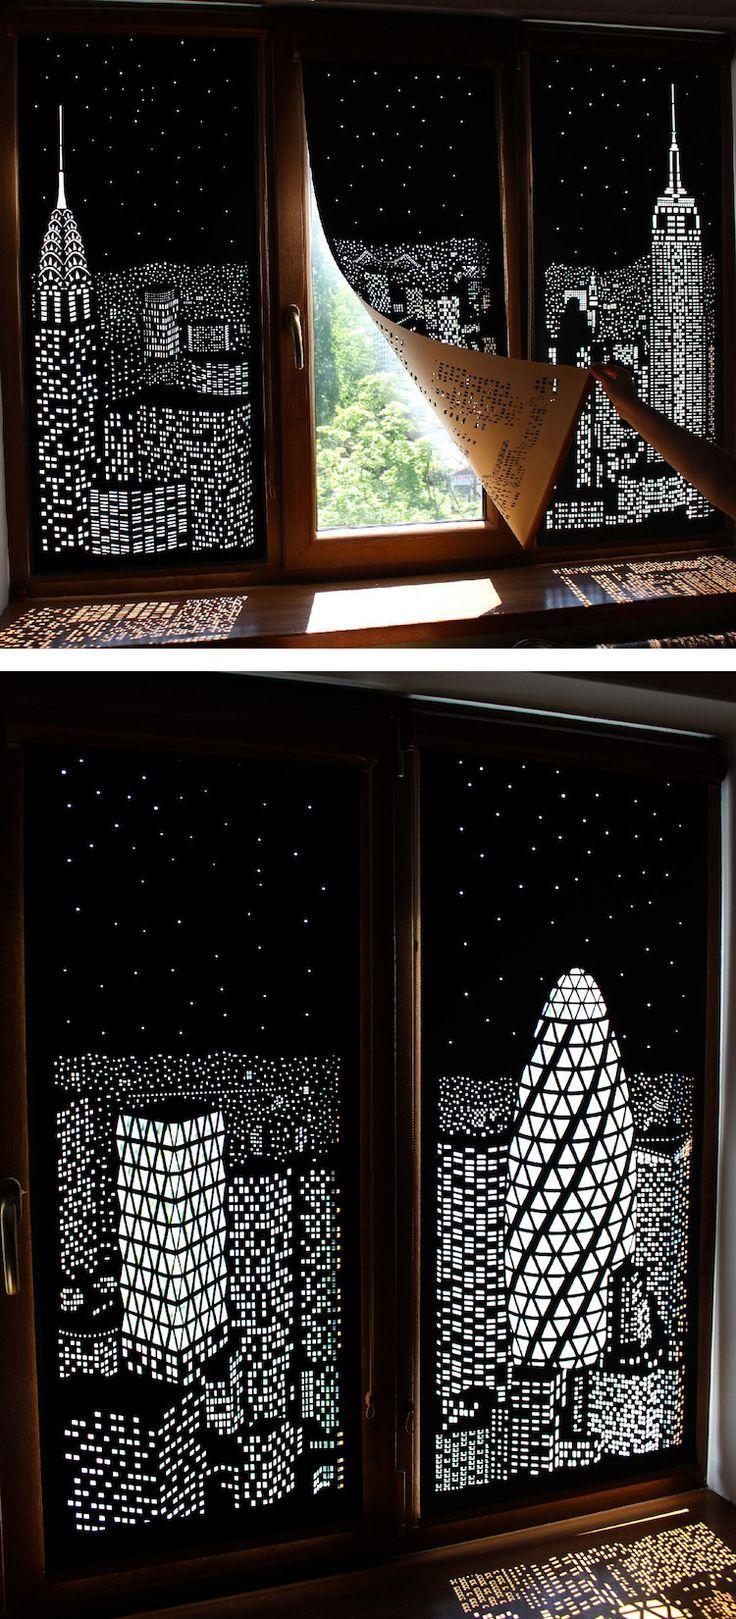 Shadow art // Window decor // decor ideas